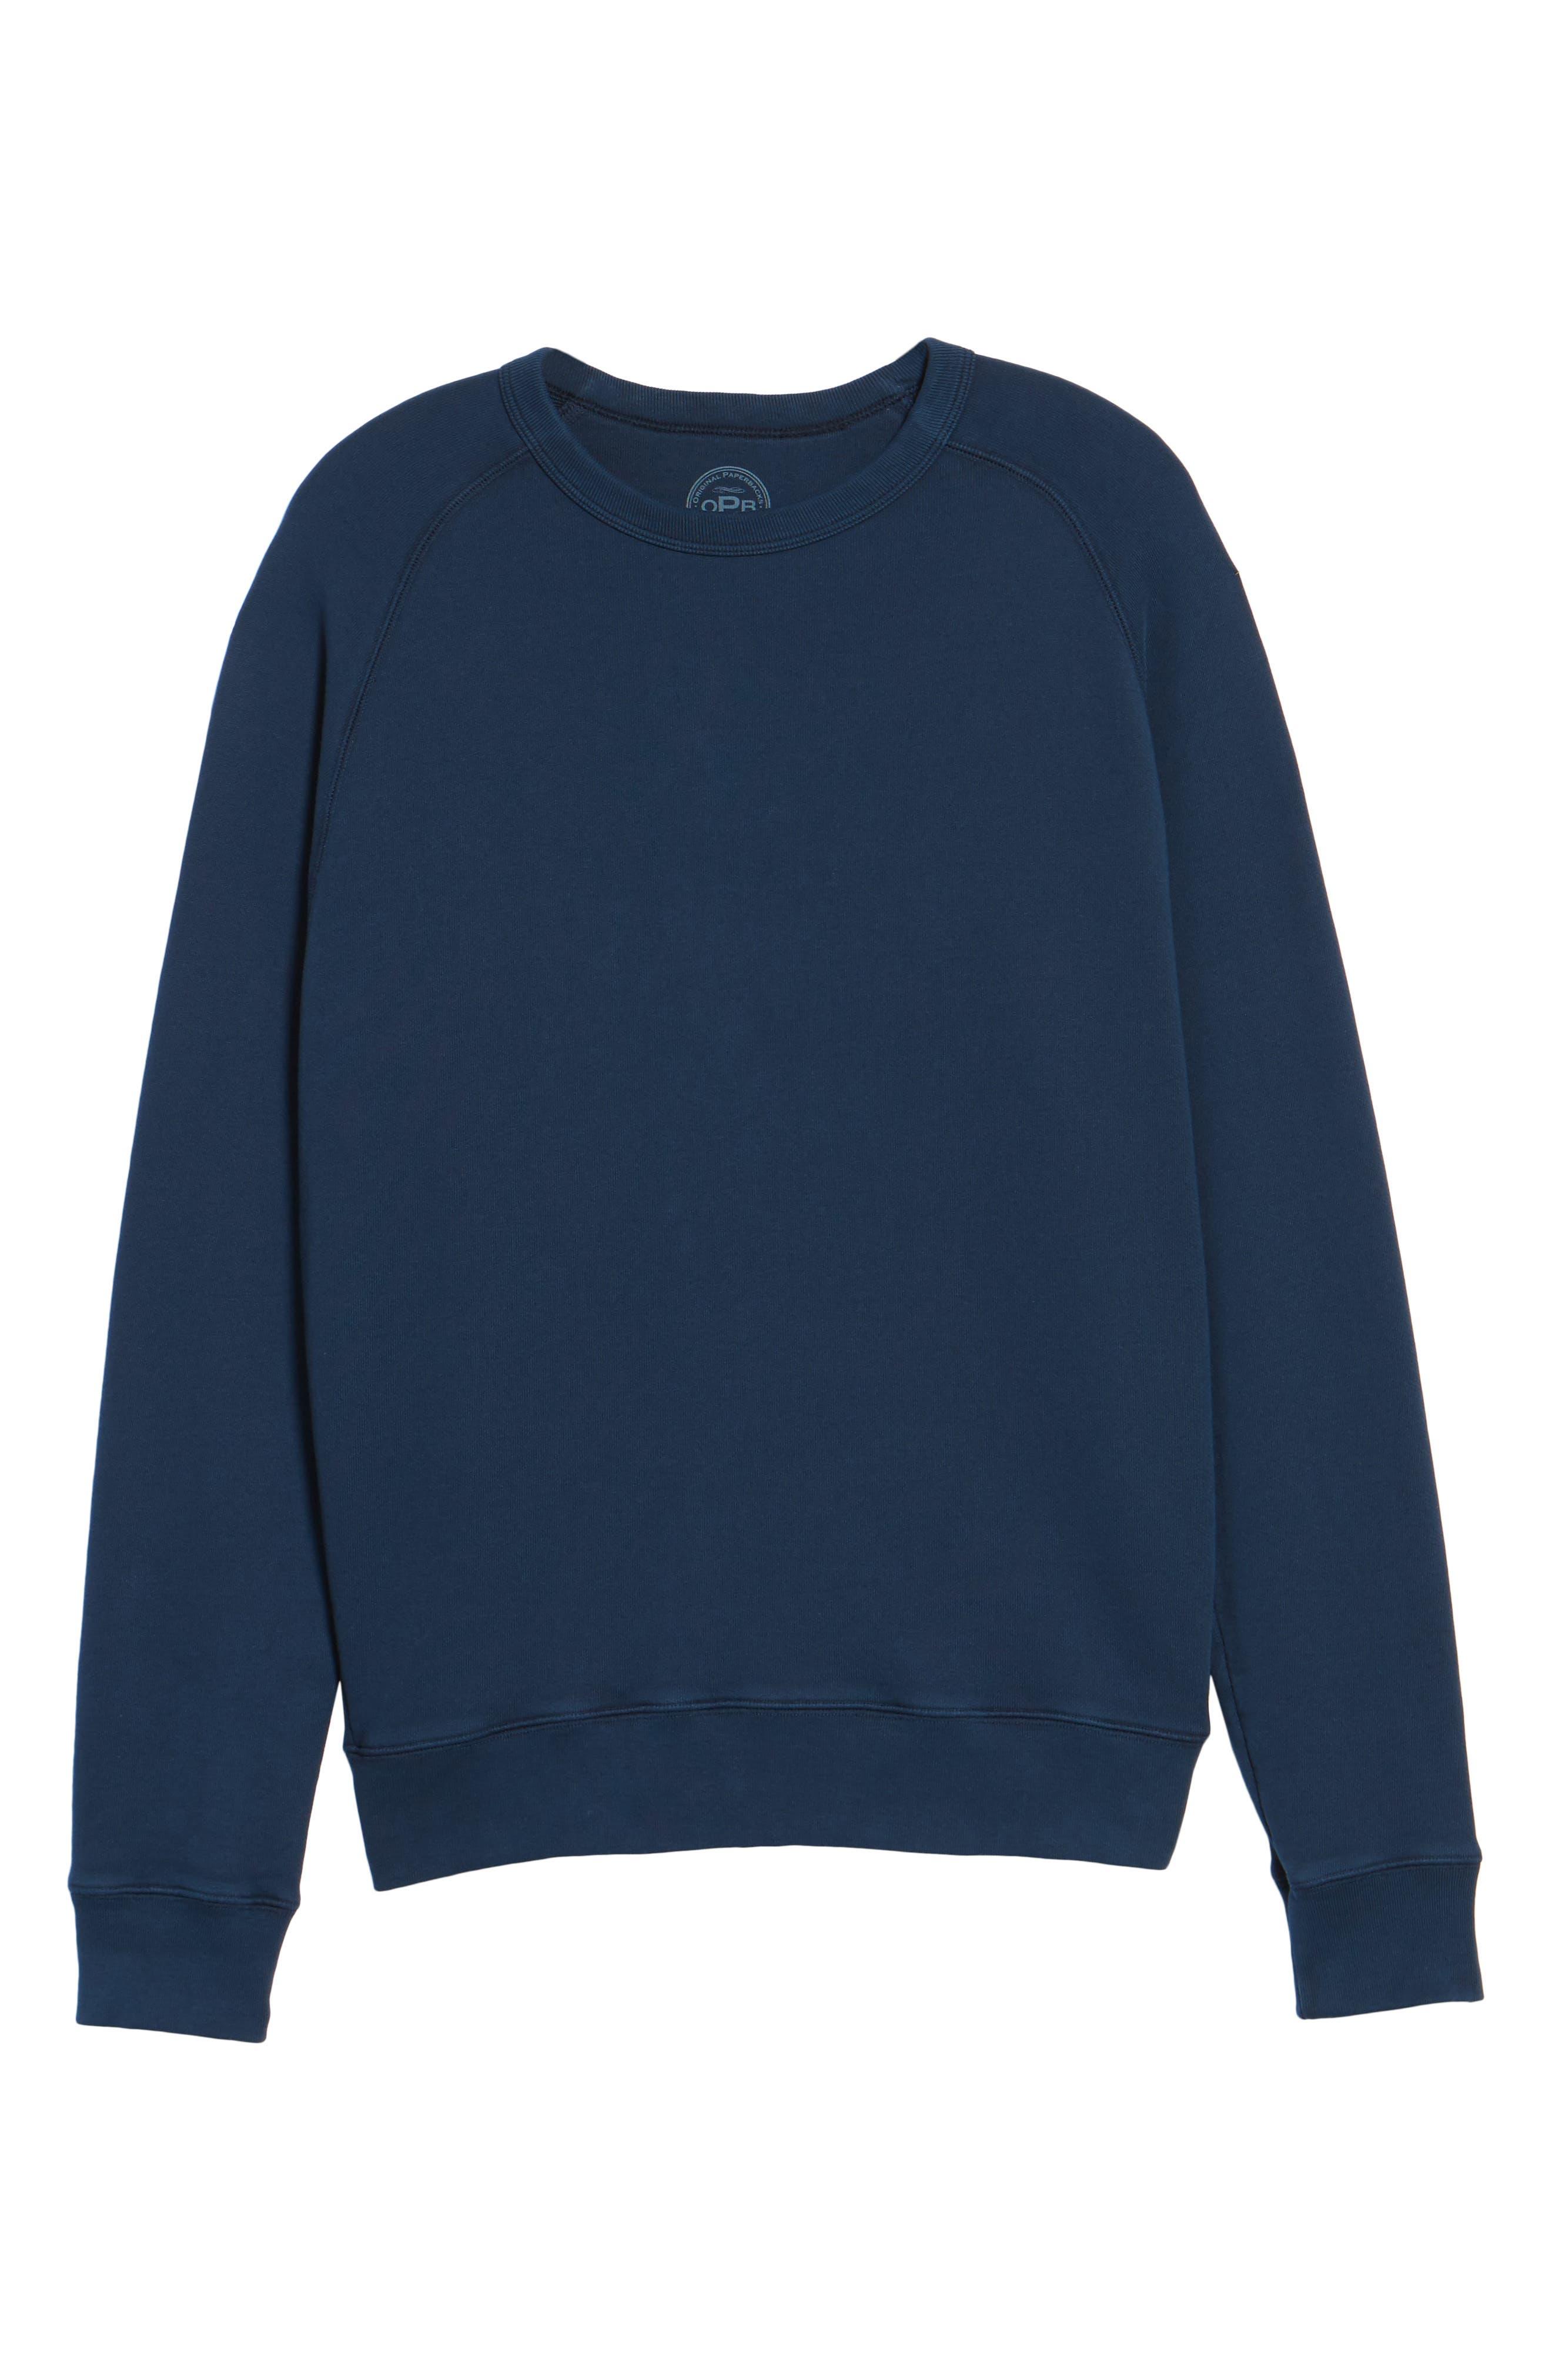 Main Image - Original Paperbacks South Sea Raglan Sweatshirt